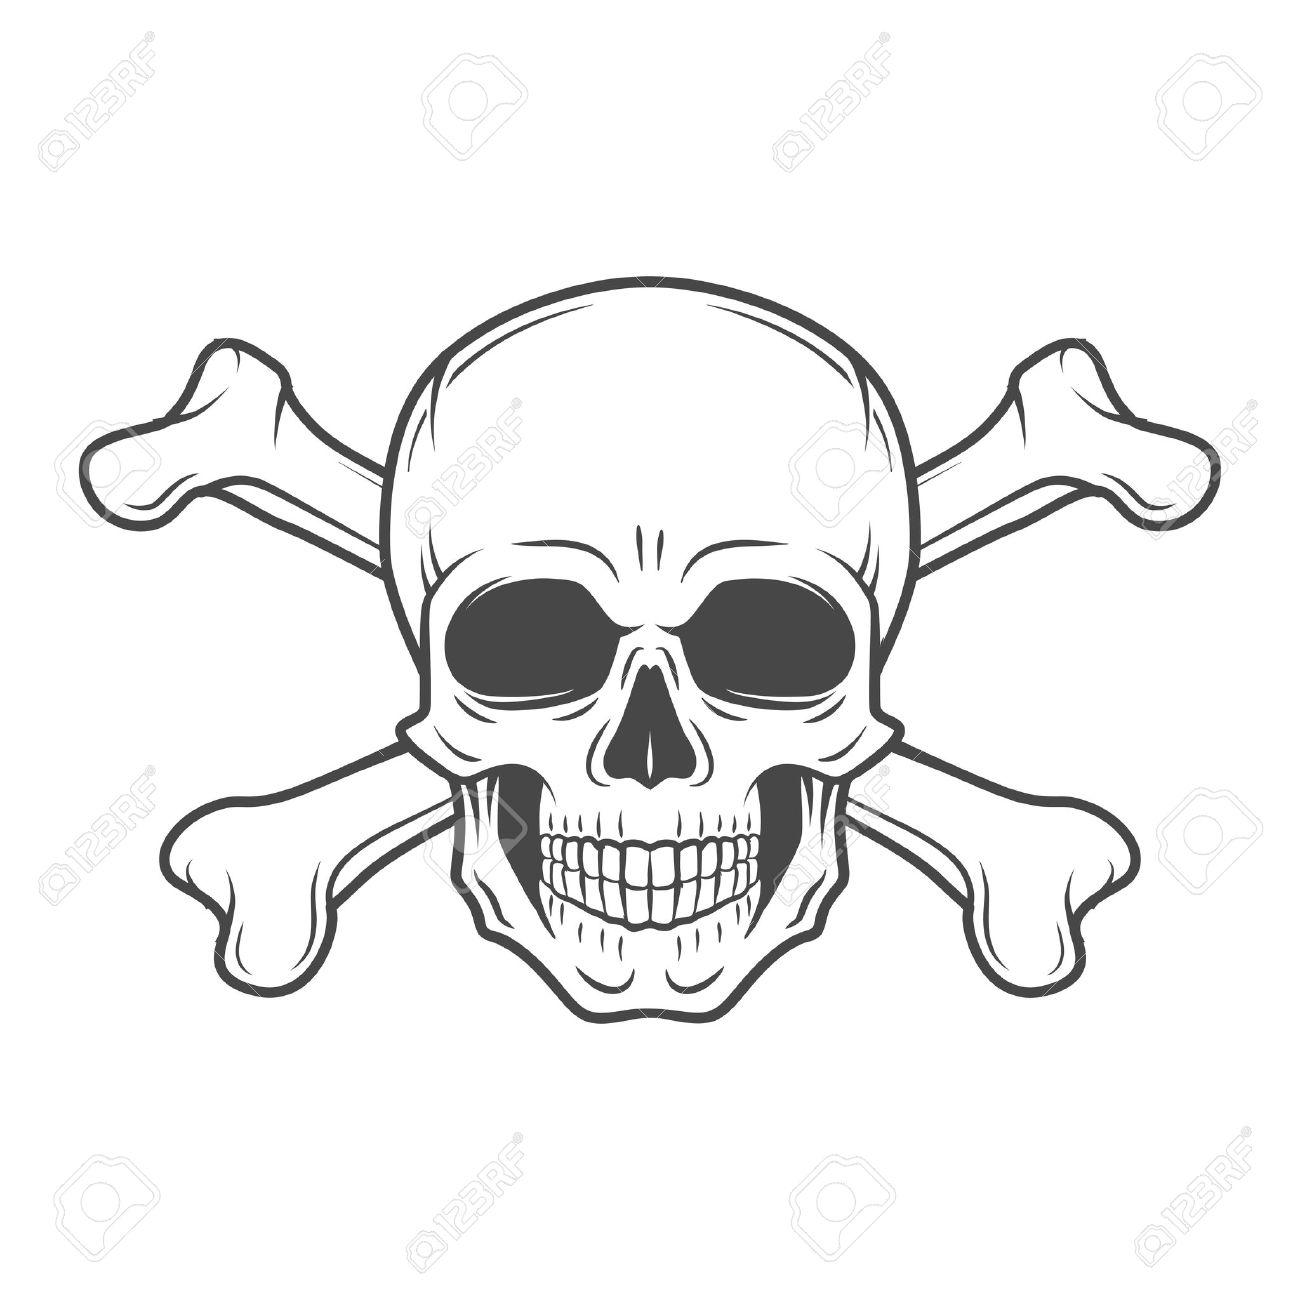 1300x1300 Human Evil Skull Vector. Pirate Insignia Concept Design. Jolly